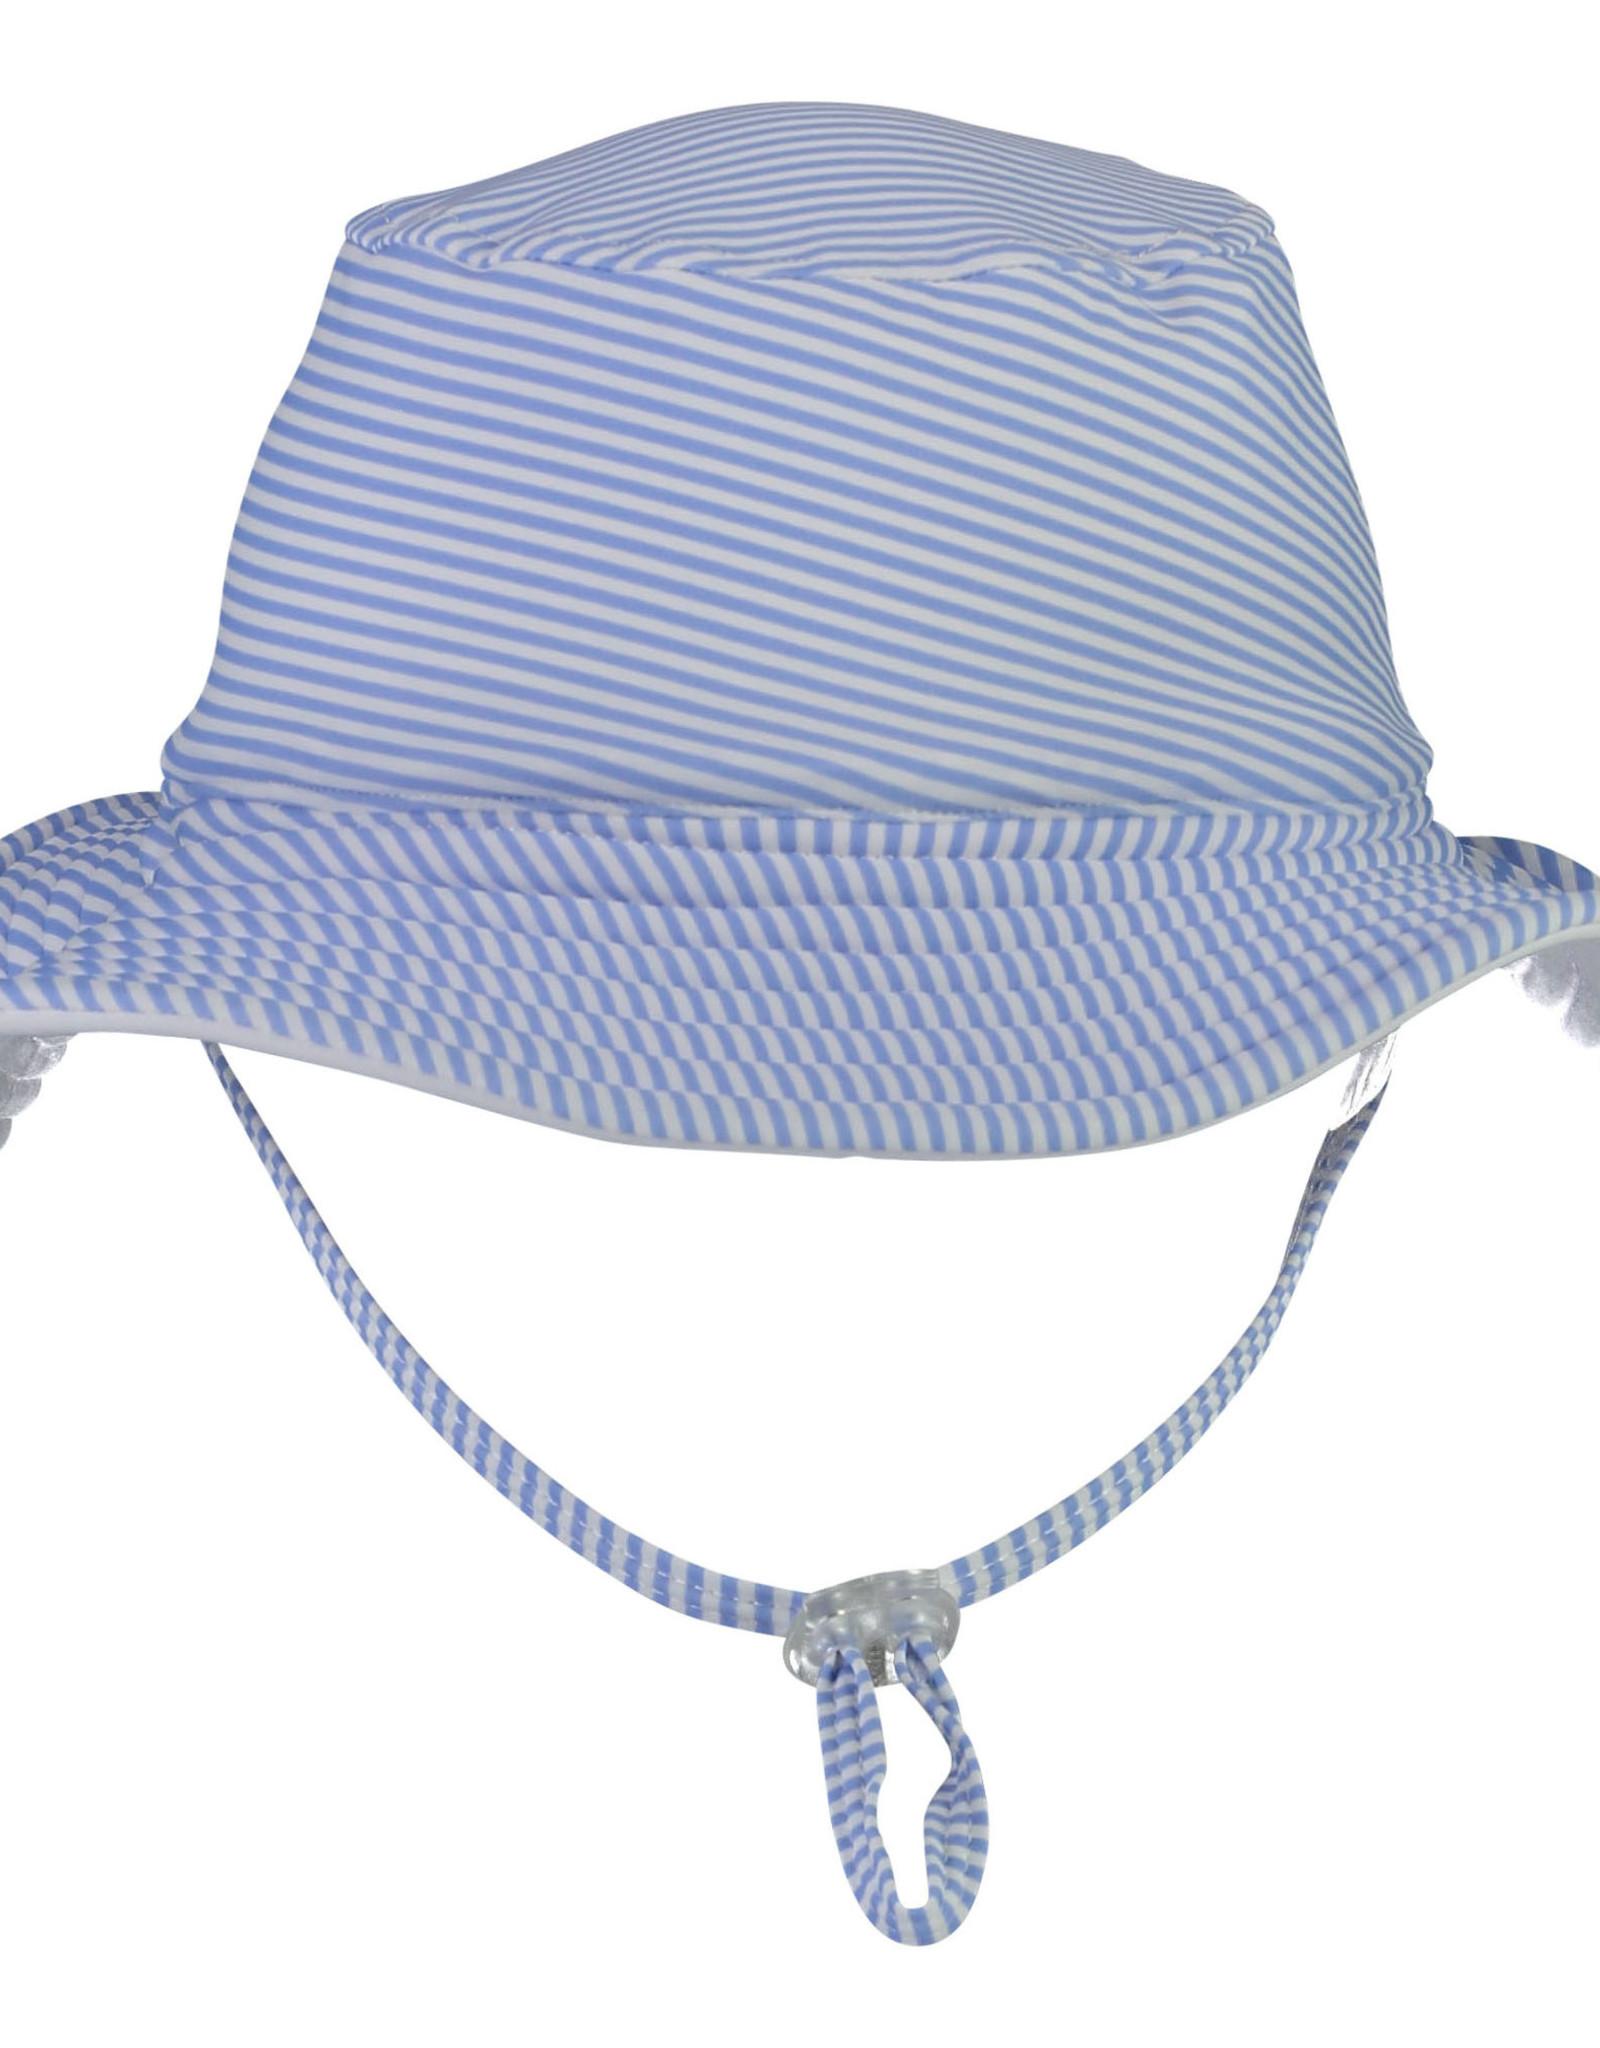 BLUE & WHITE STRIPE REVERSIBLE BUCKET HAT